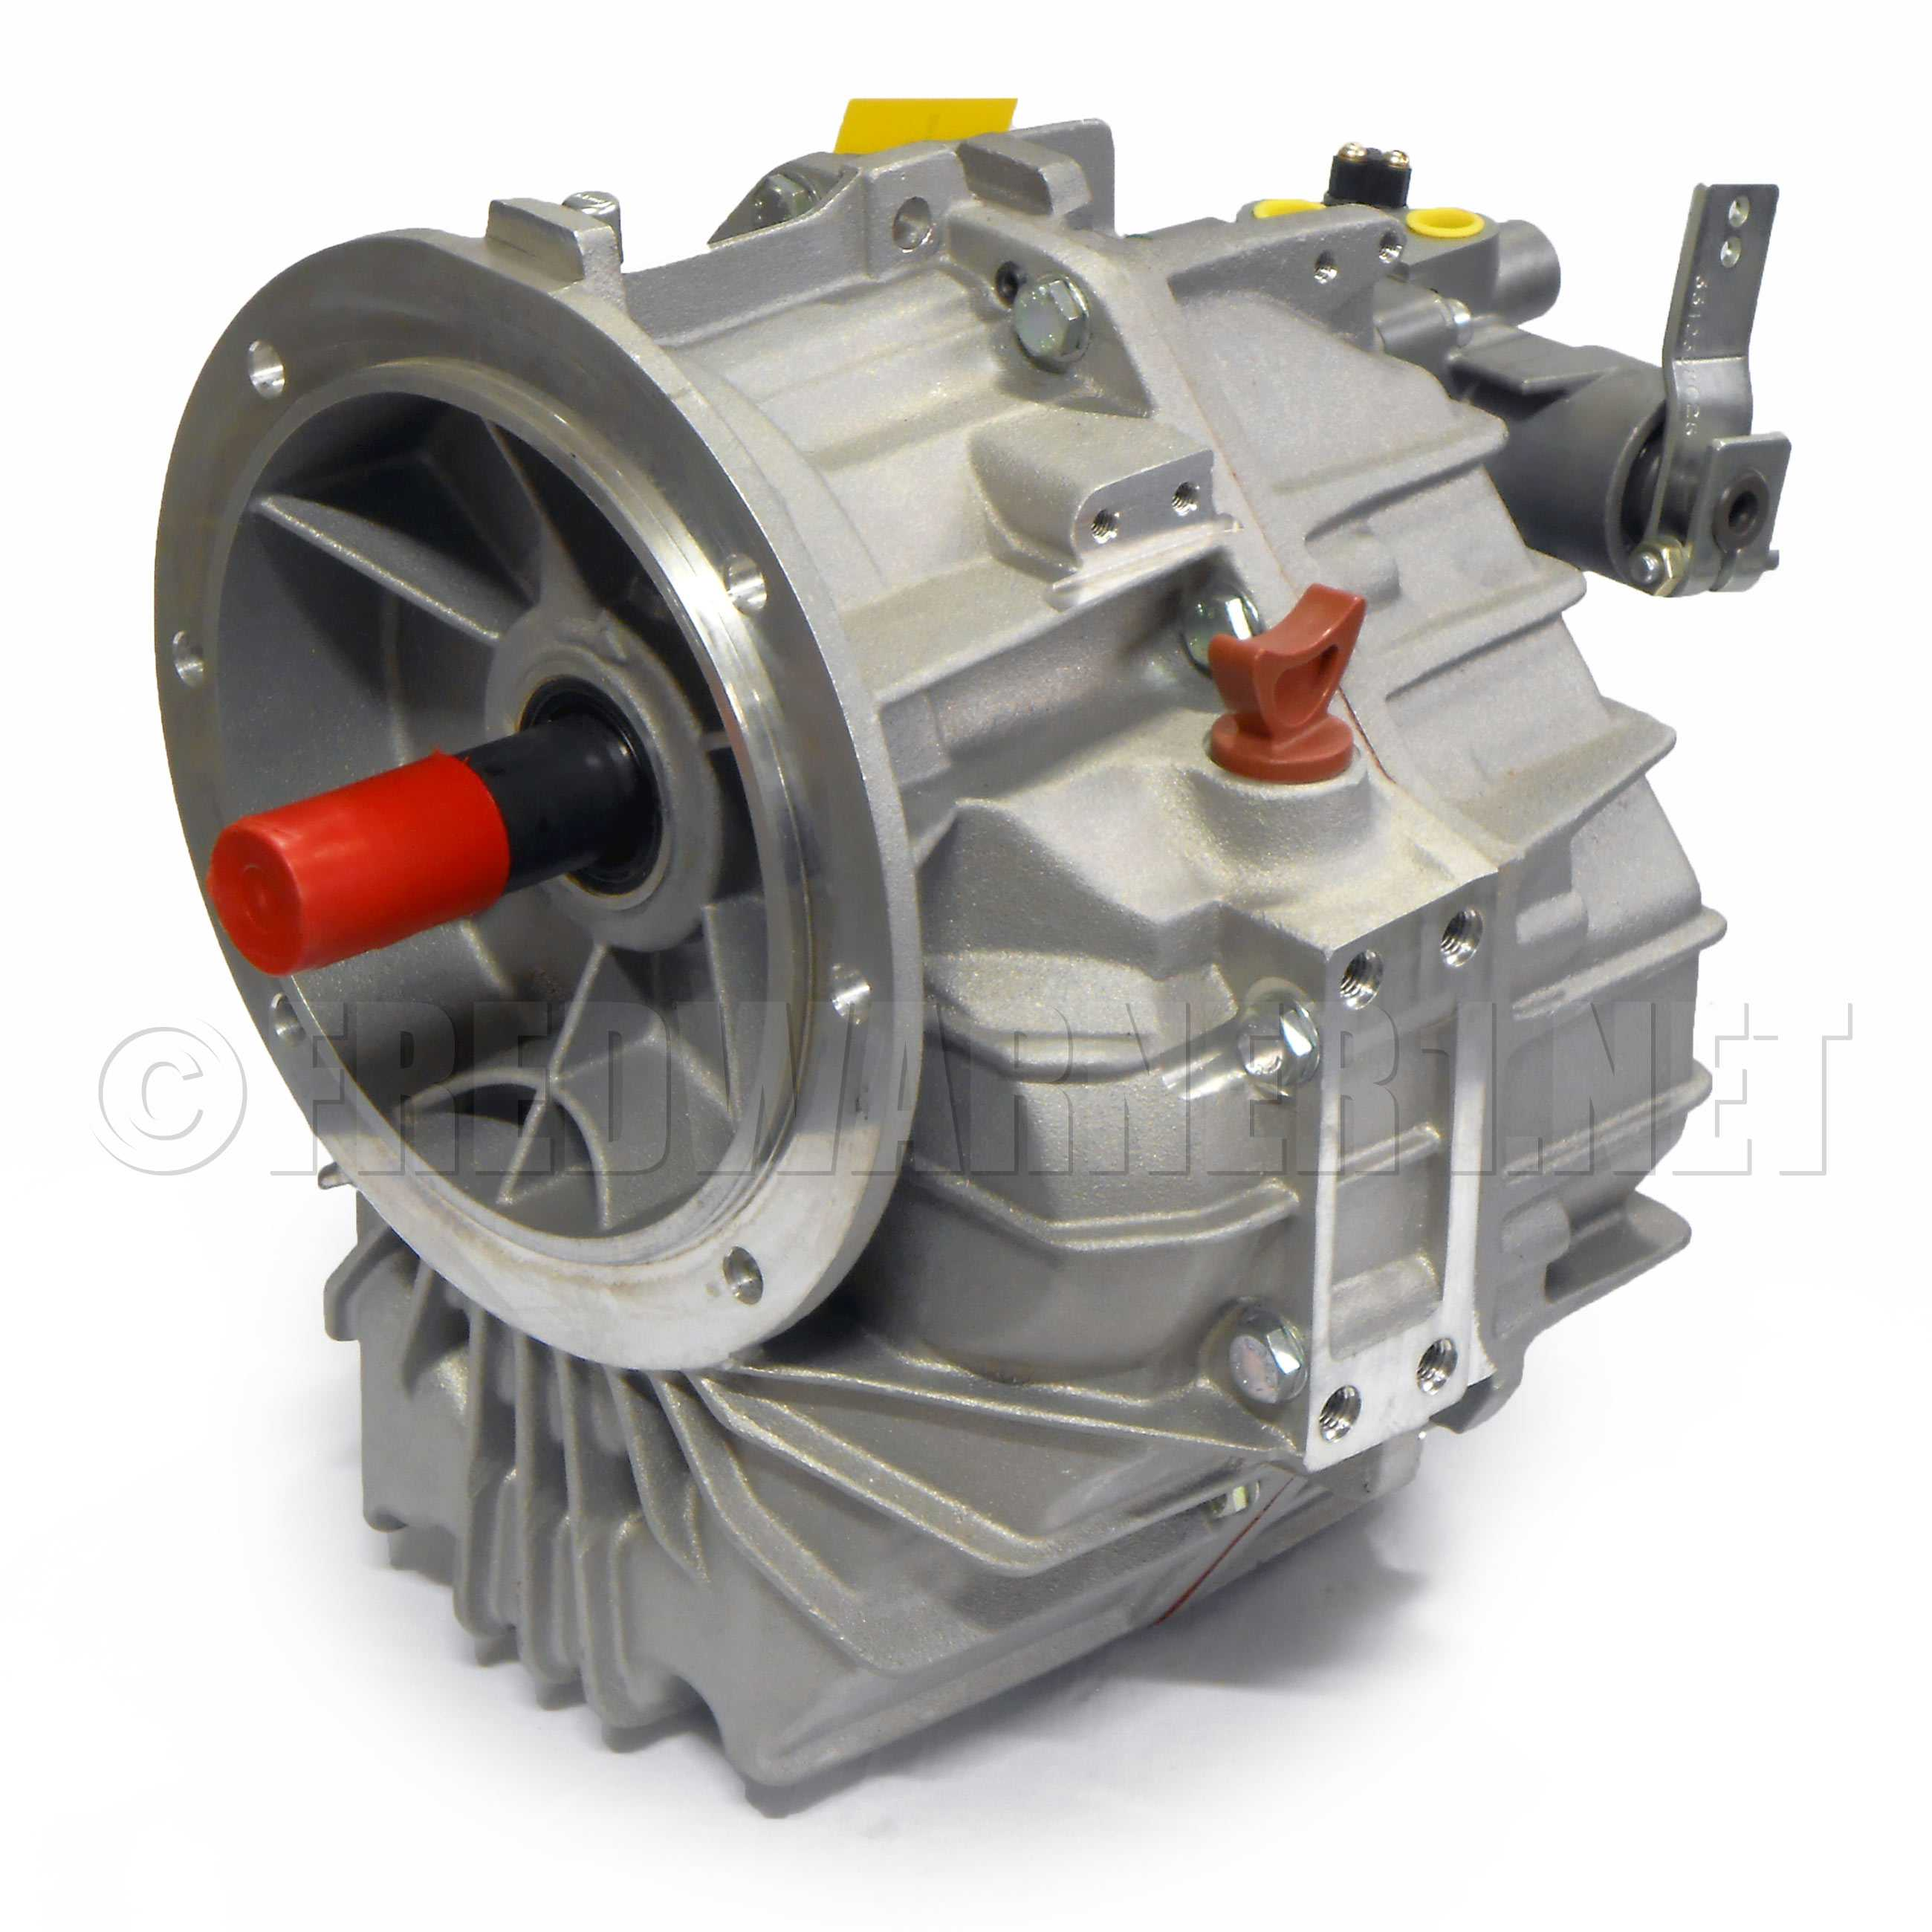 ZF 63 1.5:1 Marine Boat Transmission Gearbox Hurth HSW630H1 3312002011